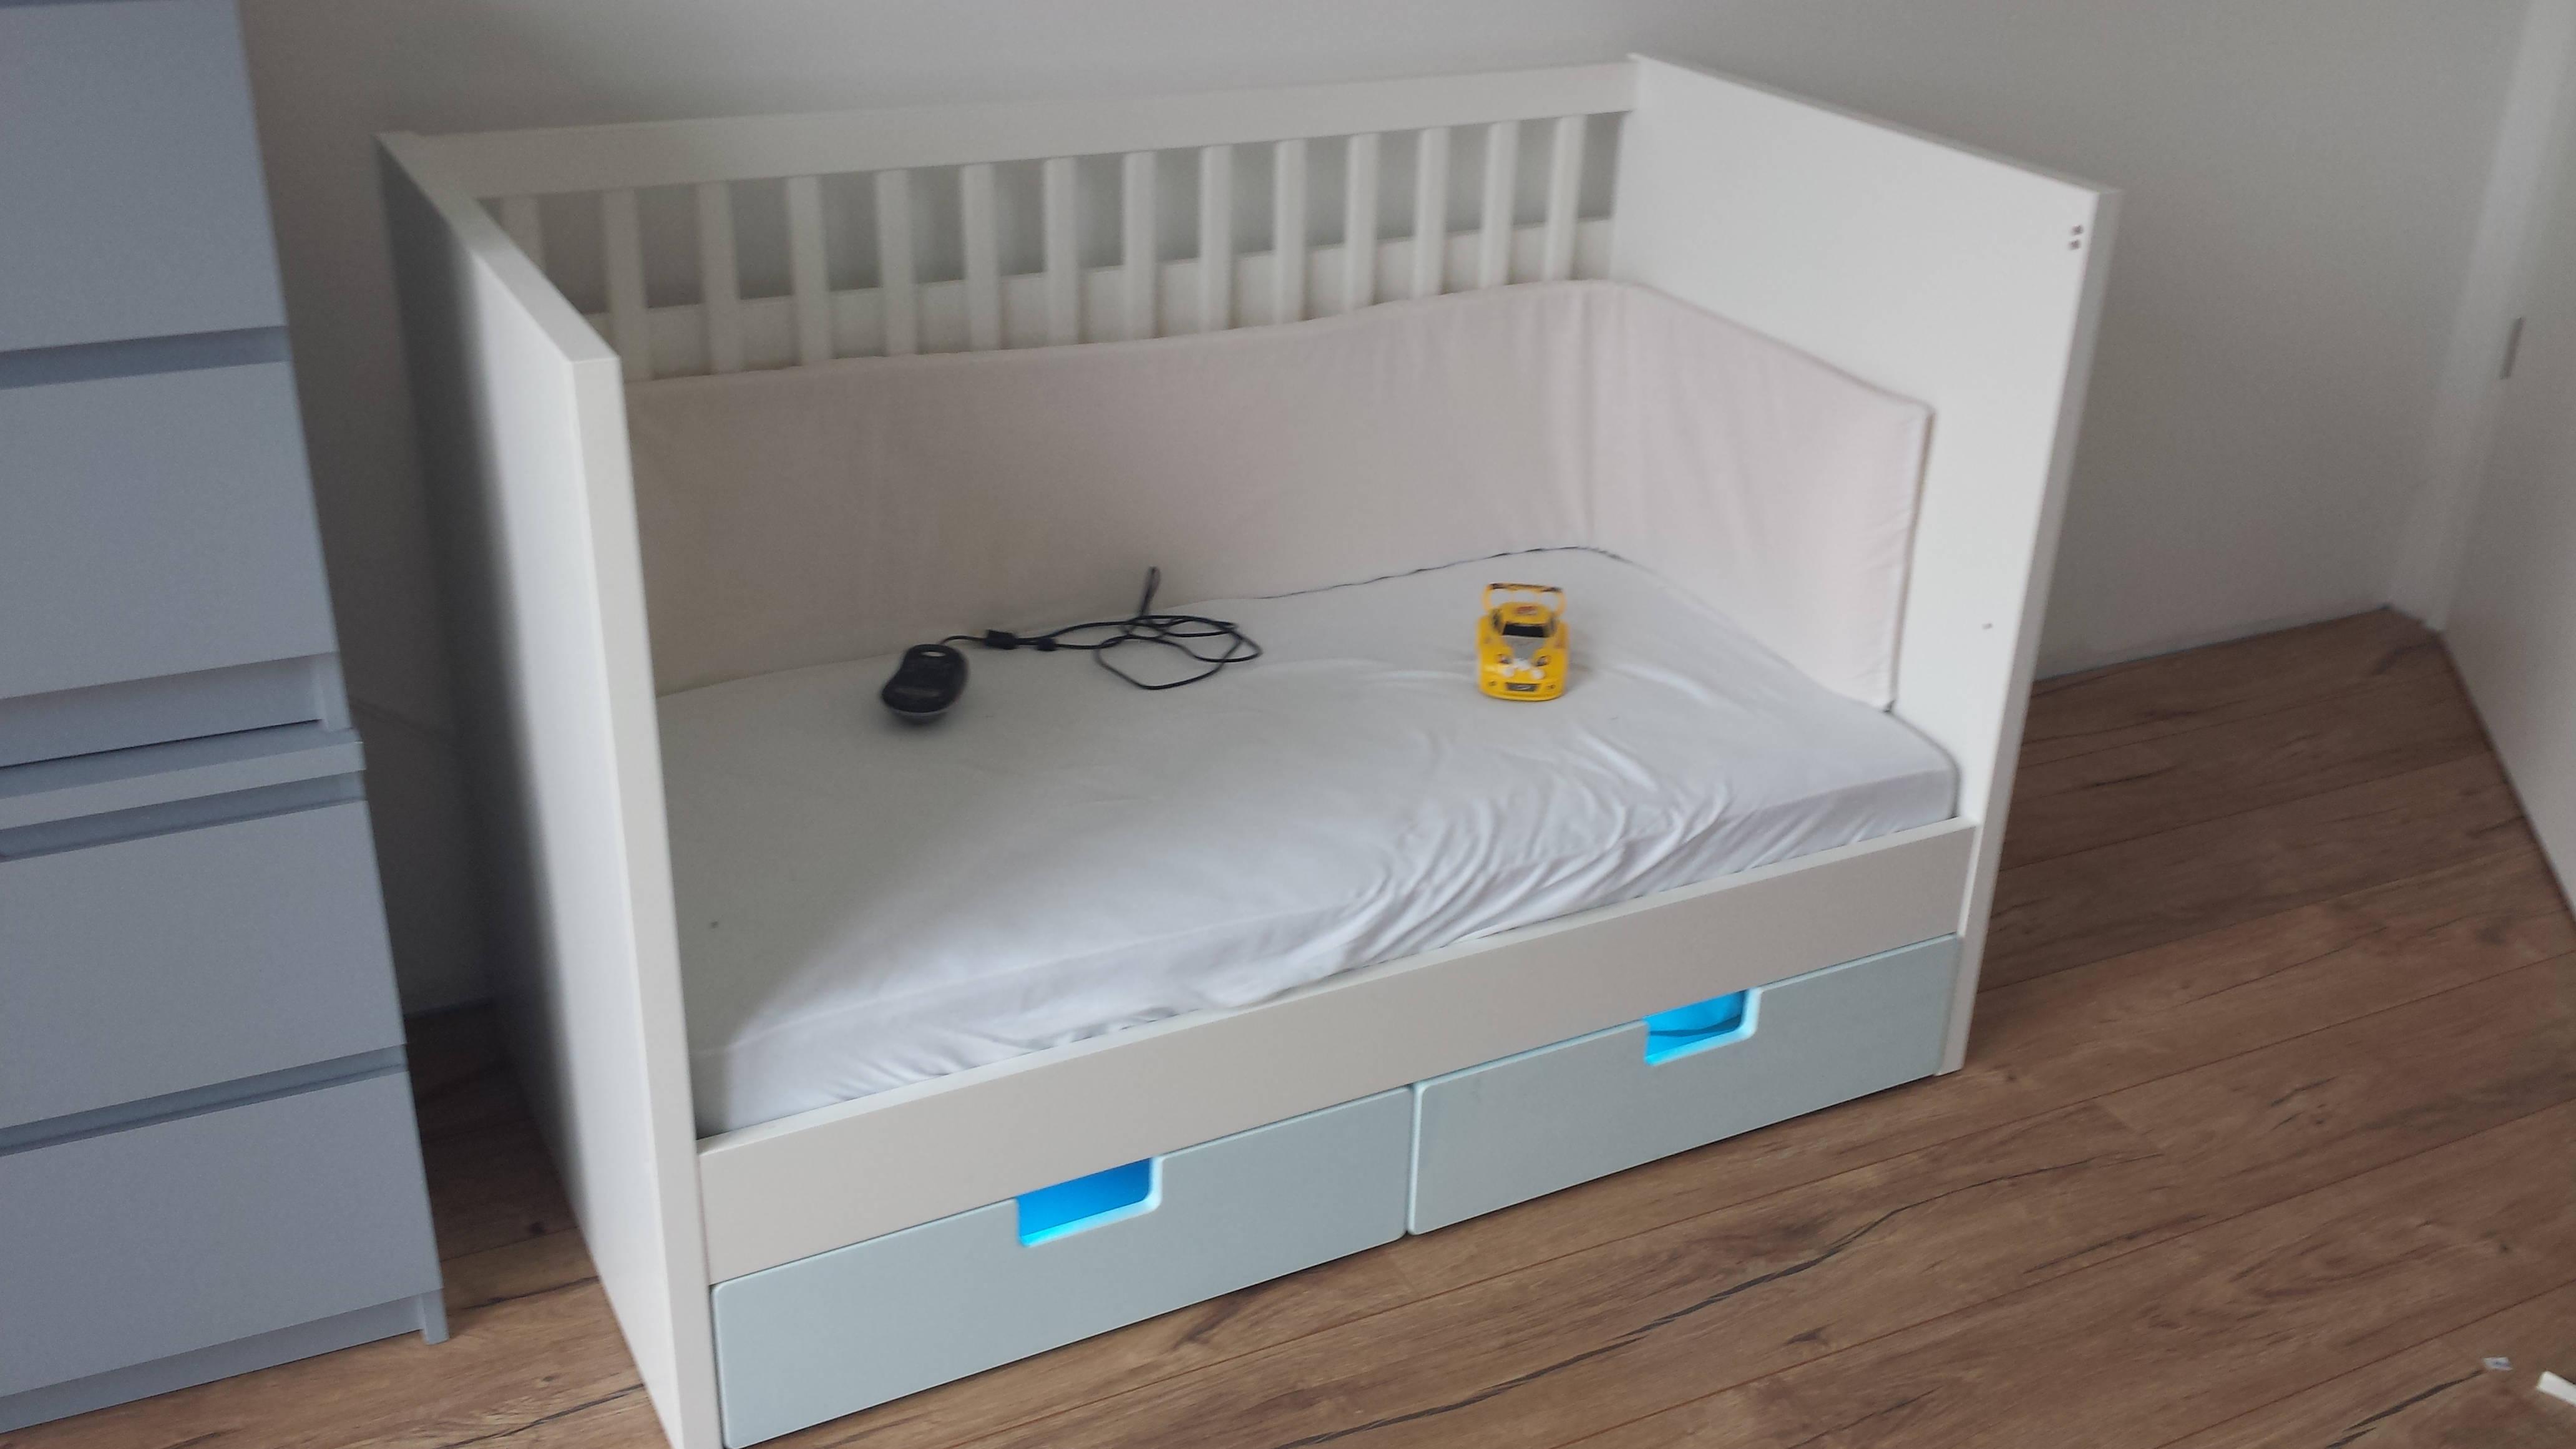 ikea babybett kontrolliert schlafzimmer temperatur make. Black Bedroom Furniture Sets. Home Design Ideas